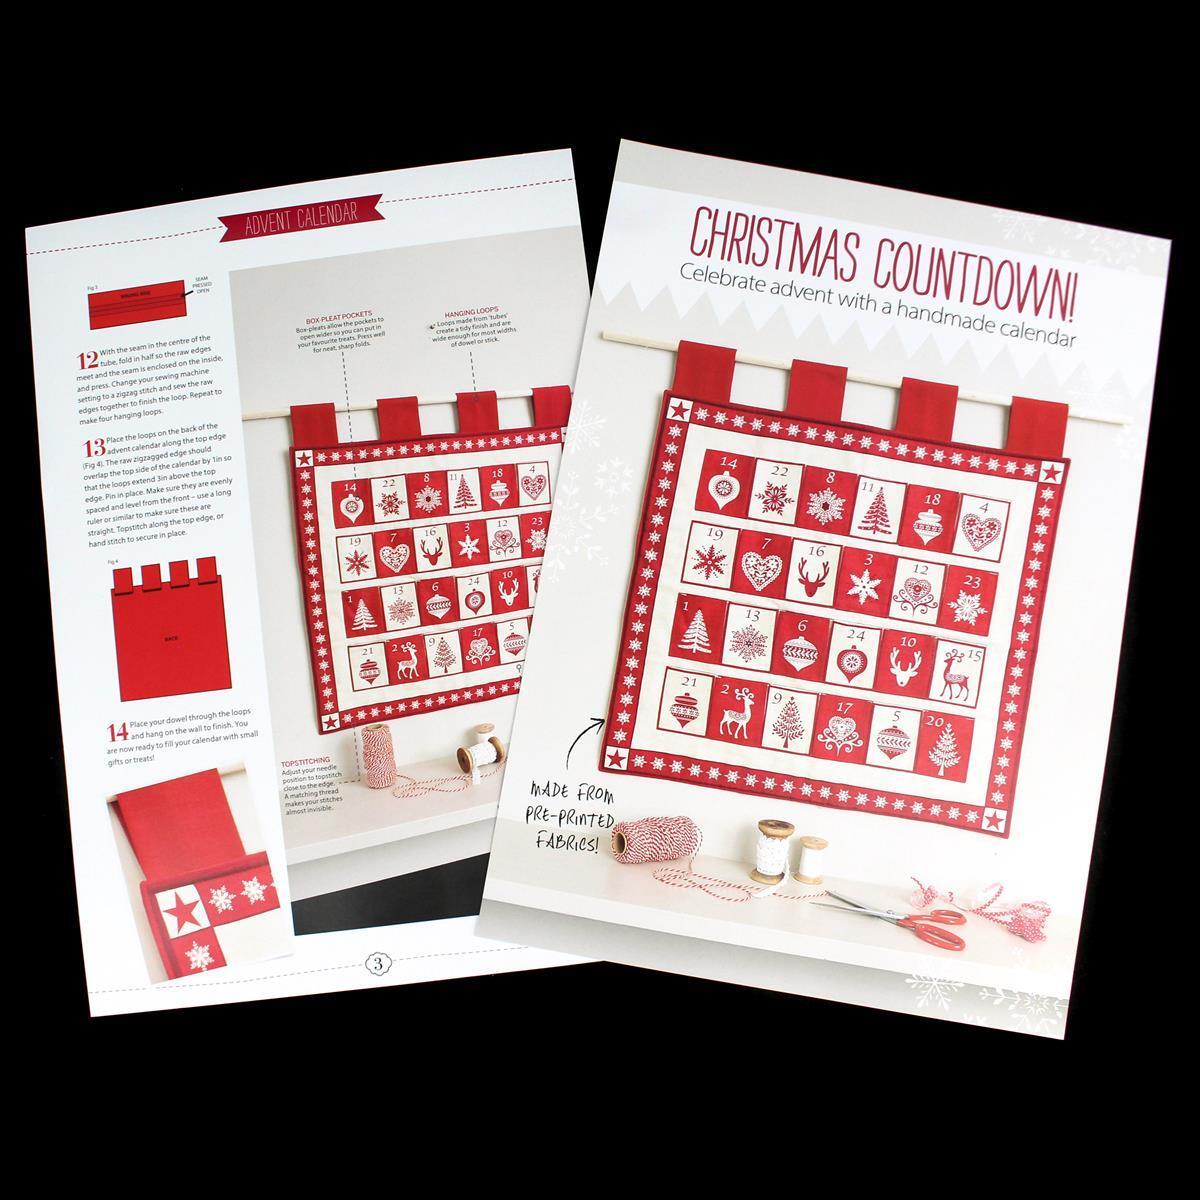 Advent Calendar Design Your Own : Make your own advent calendar jewellerymaker